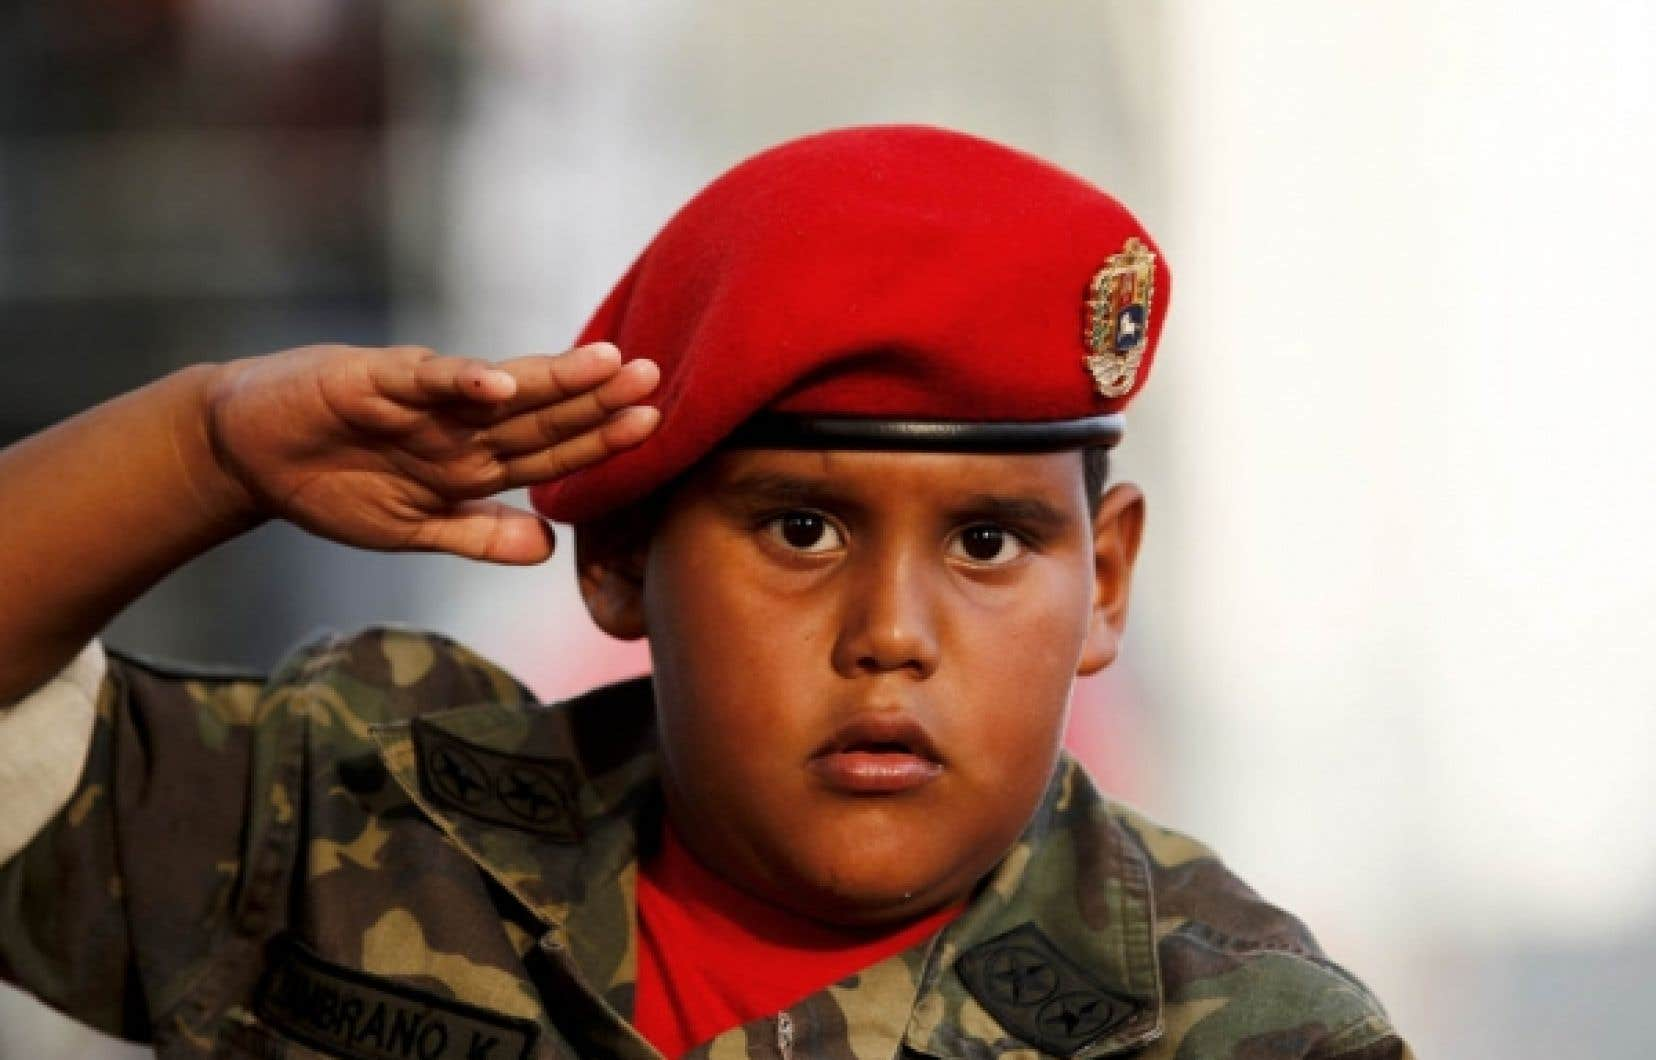 Jeune partisan du président Chávez<br />